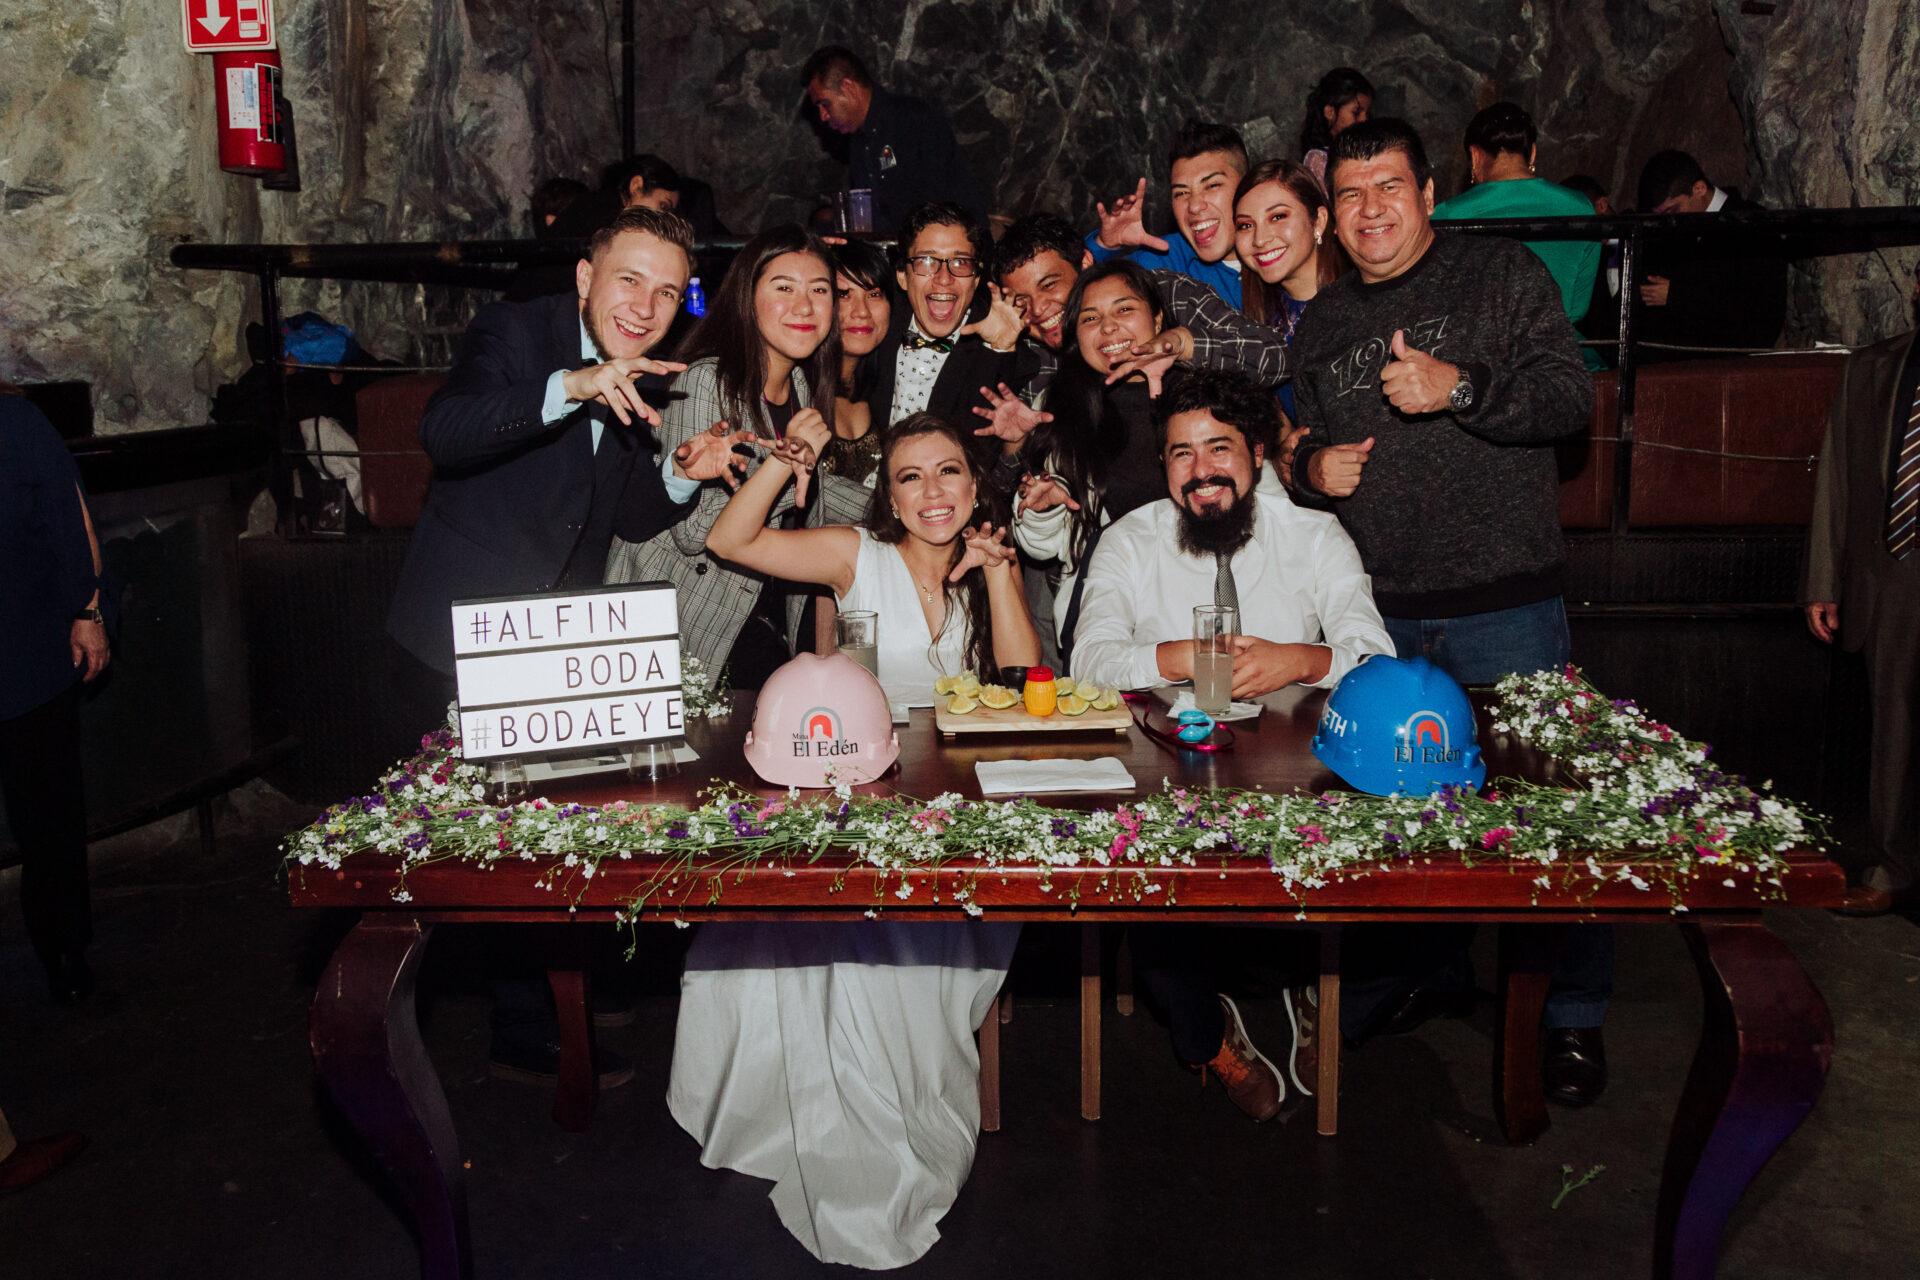 javier_noriega_fotografo_bodas_la_mina_club_zacatecas_wedding_photographer22